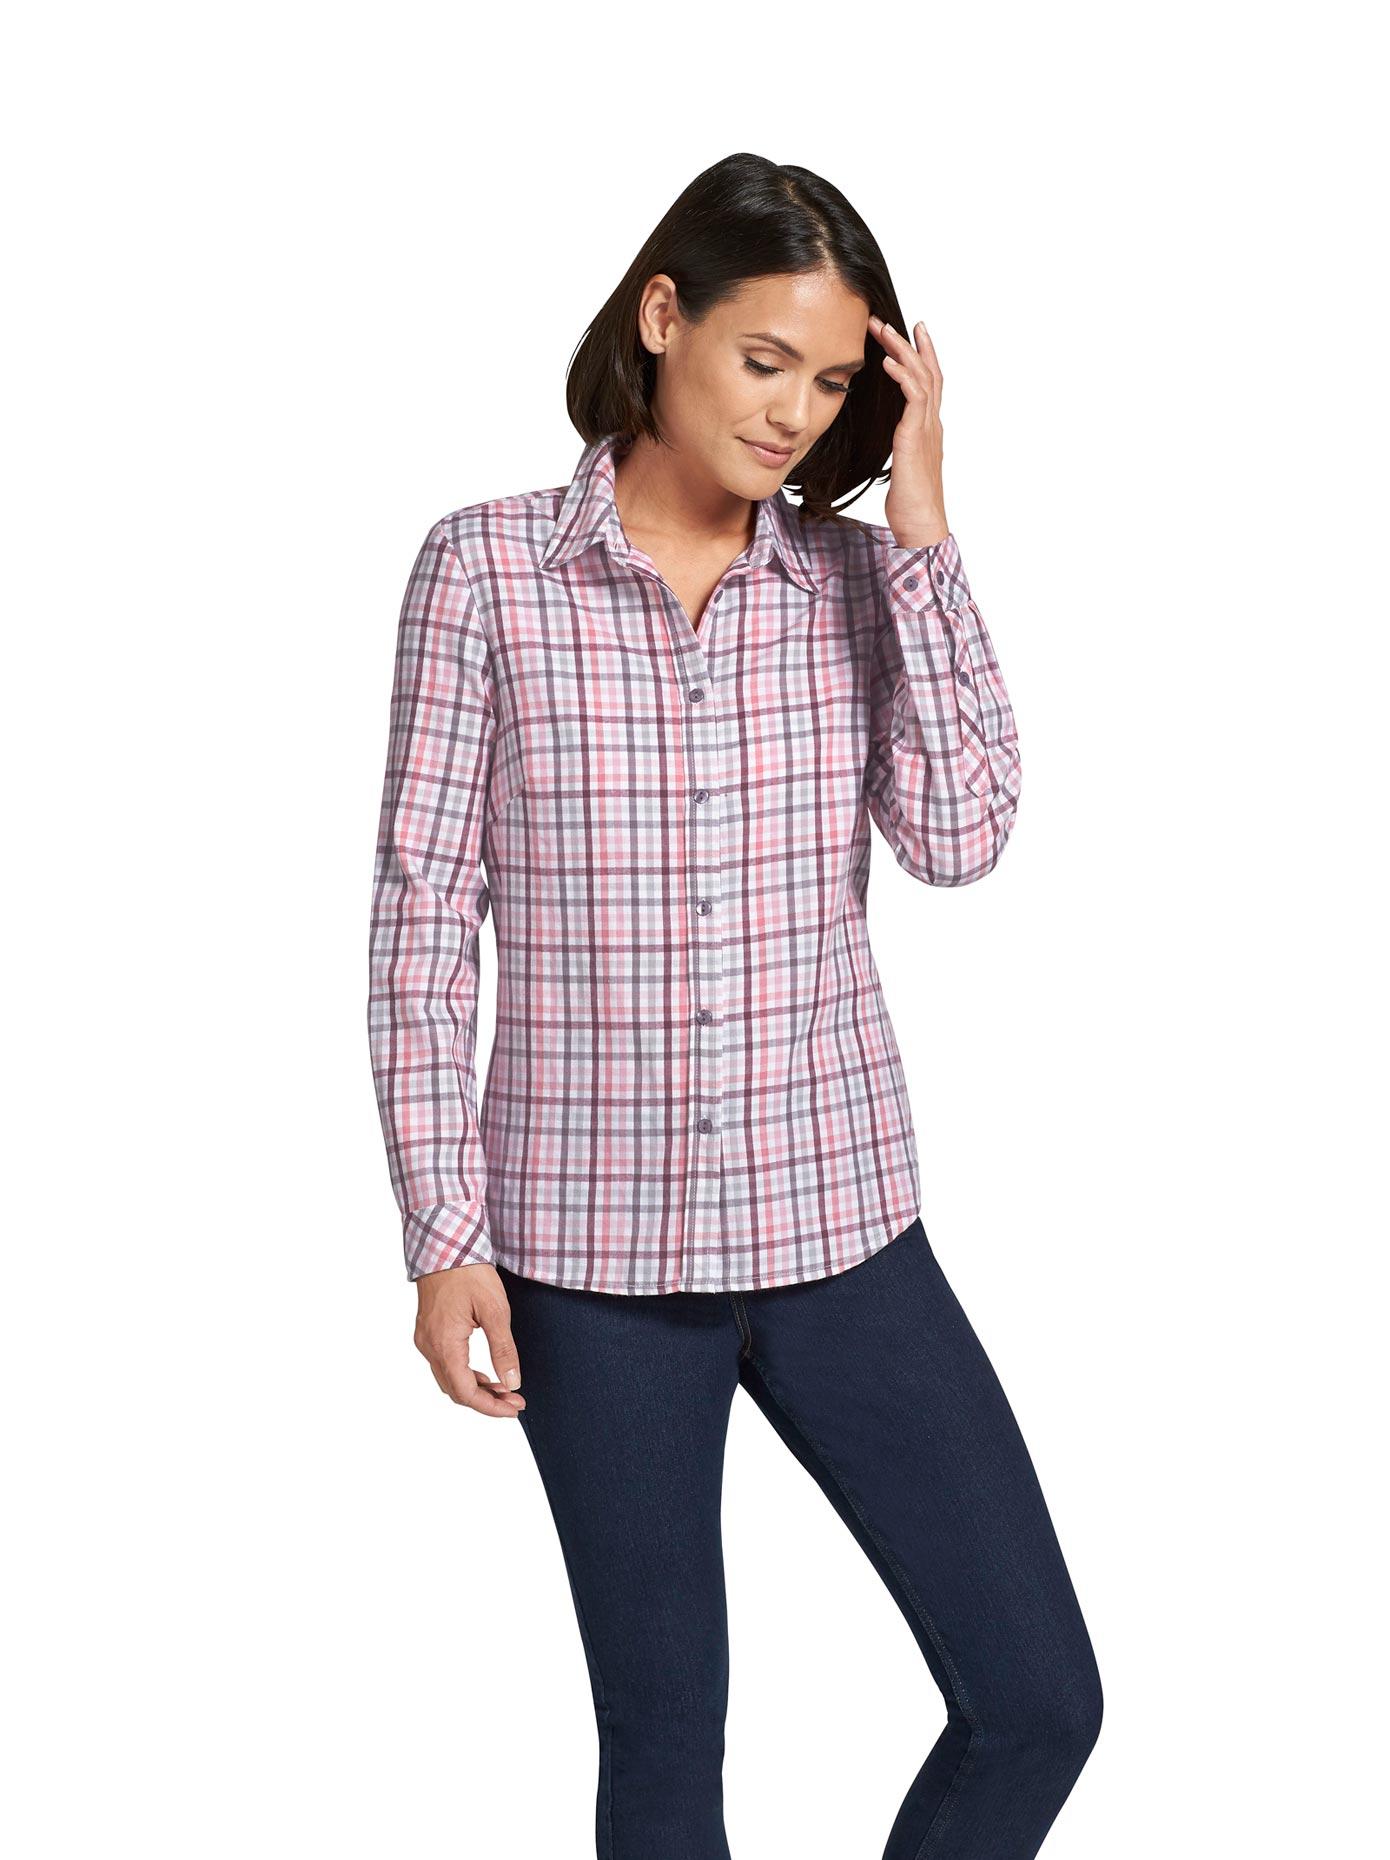 Classic Basics Bluse in wärmender Flanell-Qualität